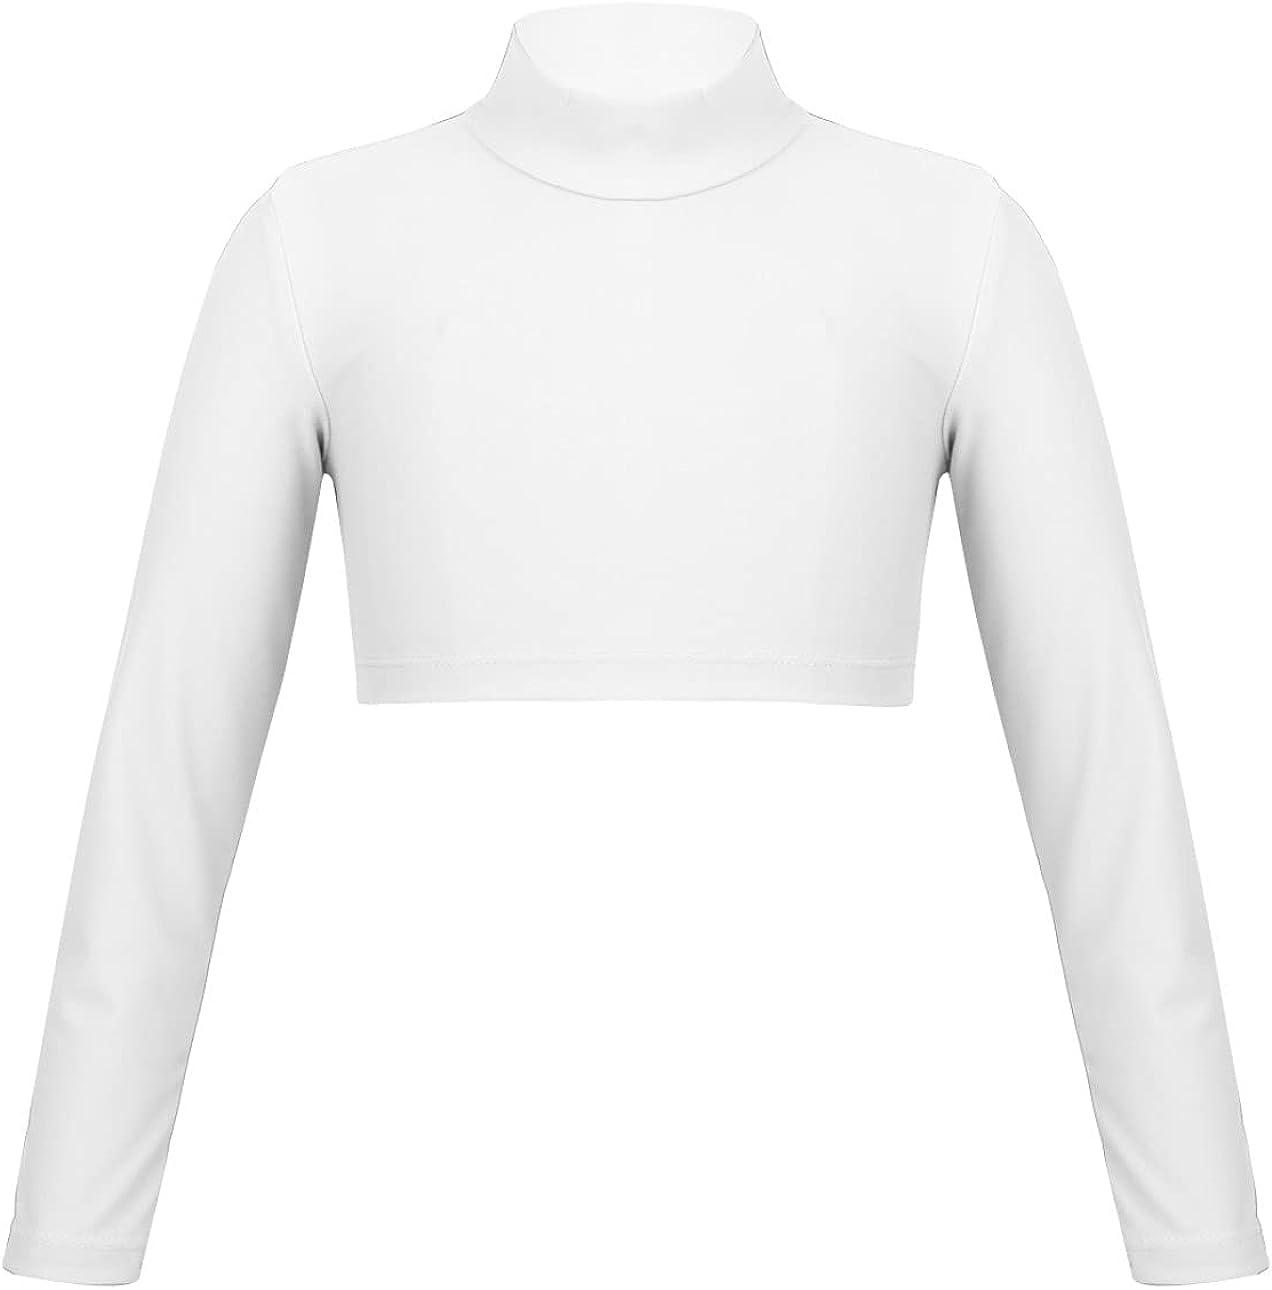 Yihuimin Girls Solid Mock Long Sleeve Crop Top Ballet Dance Shirts Gym Yoga Tight Sports T Shirts